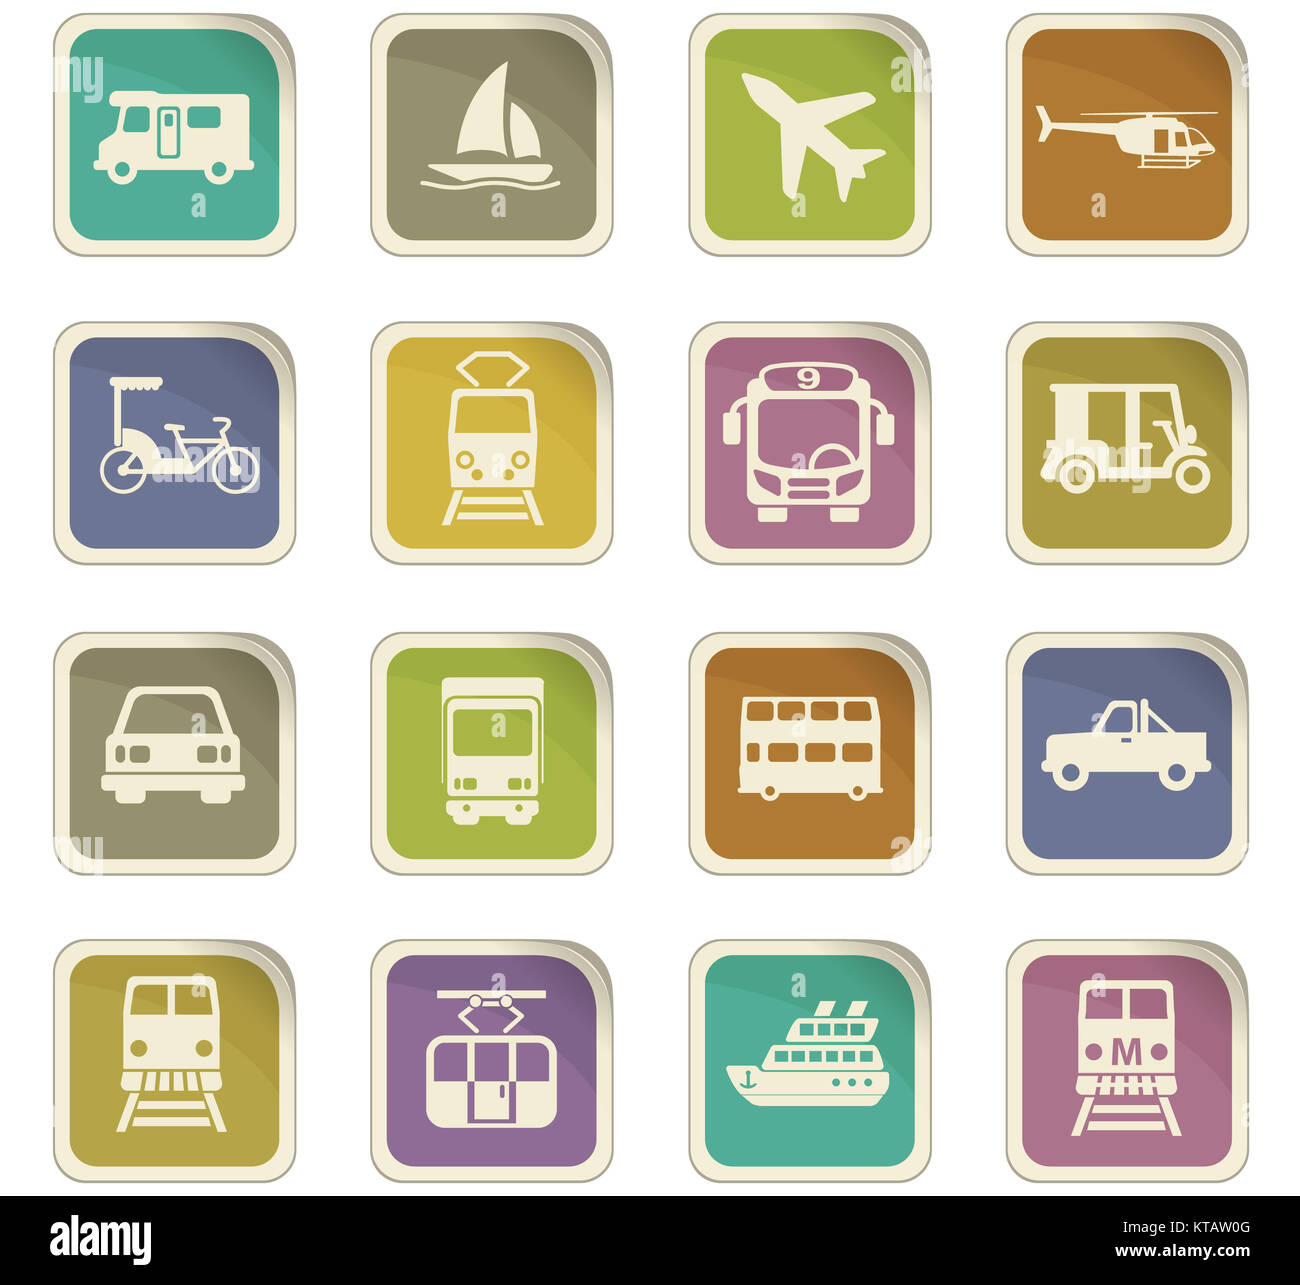 transport icon set - Stock Image